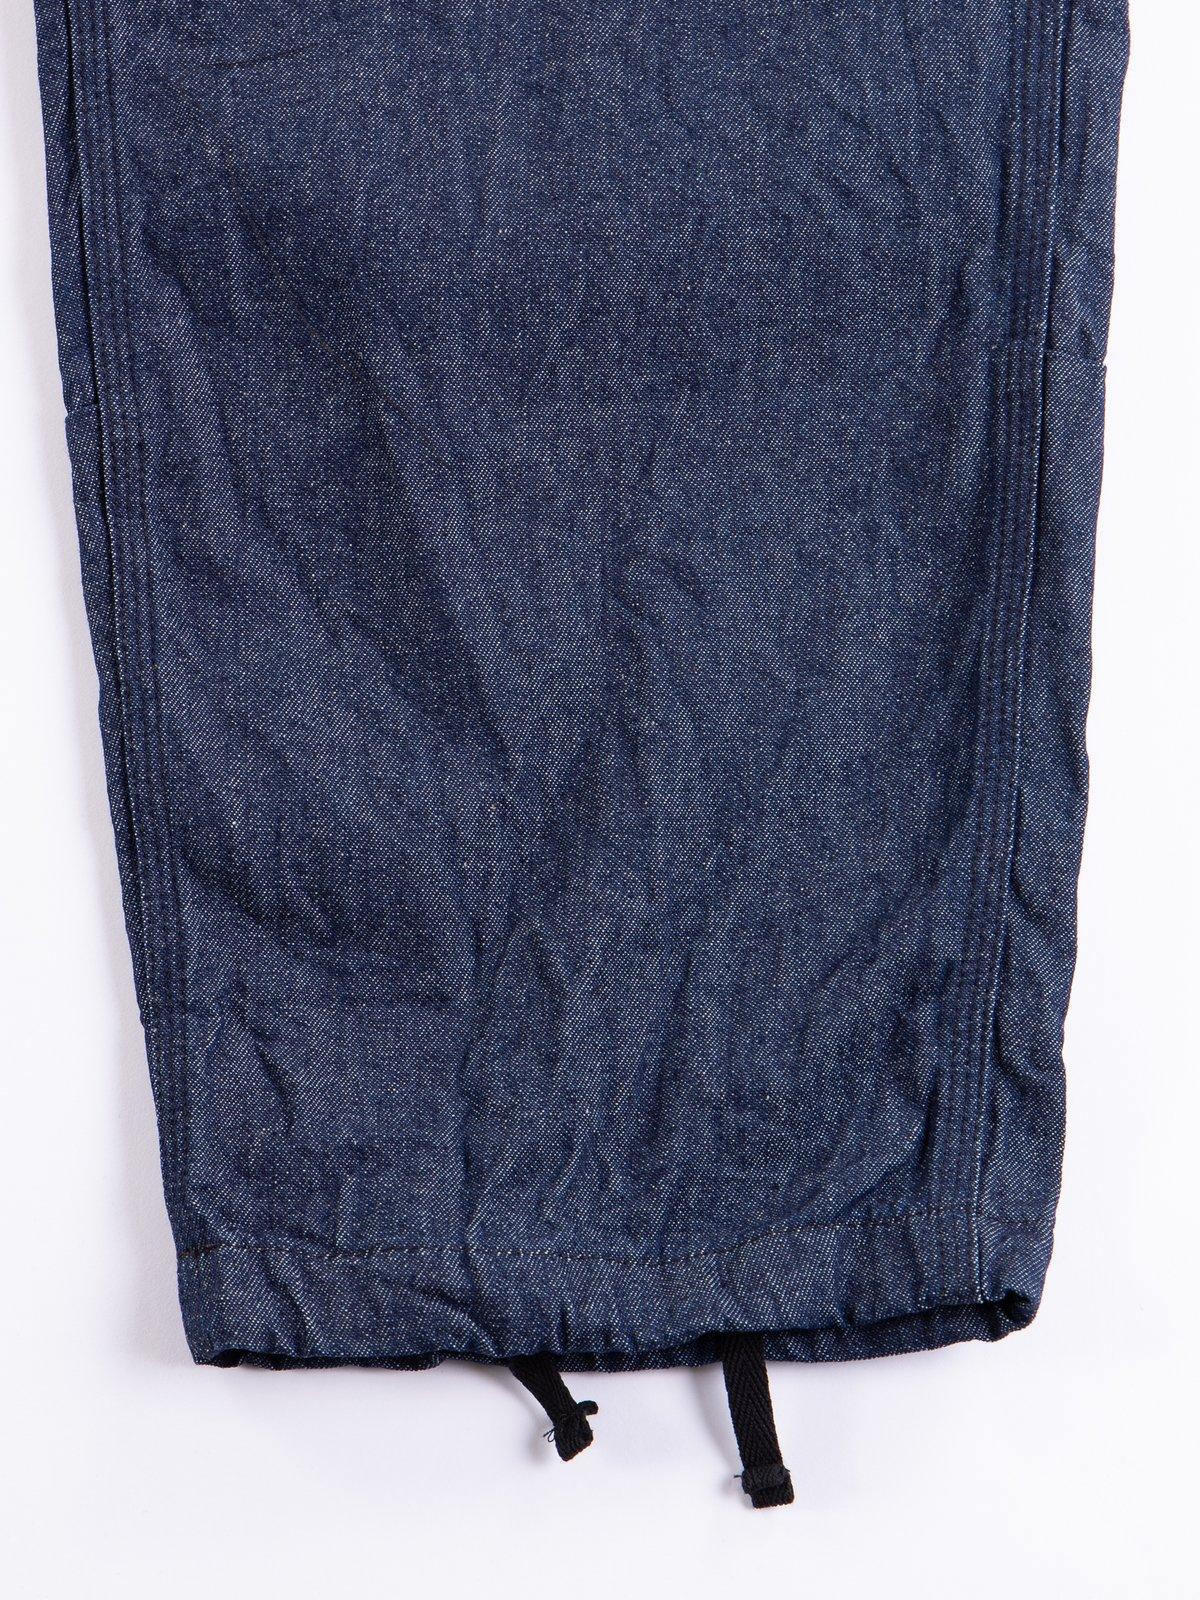 Dark 8oz Denim Solid Painter Pant - Image 4